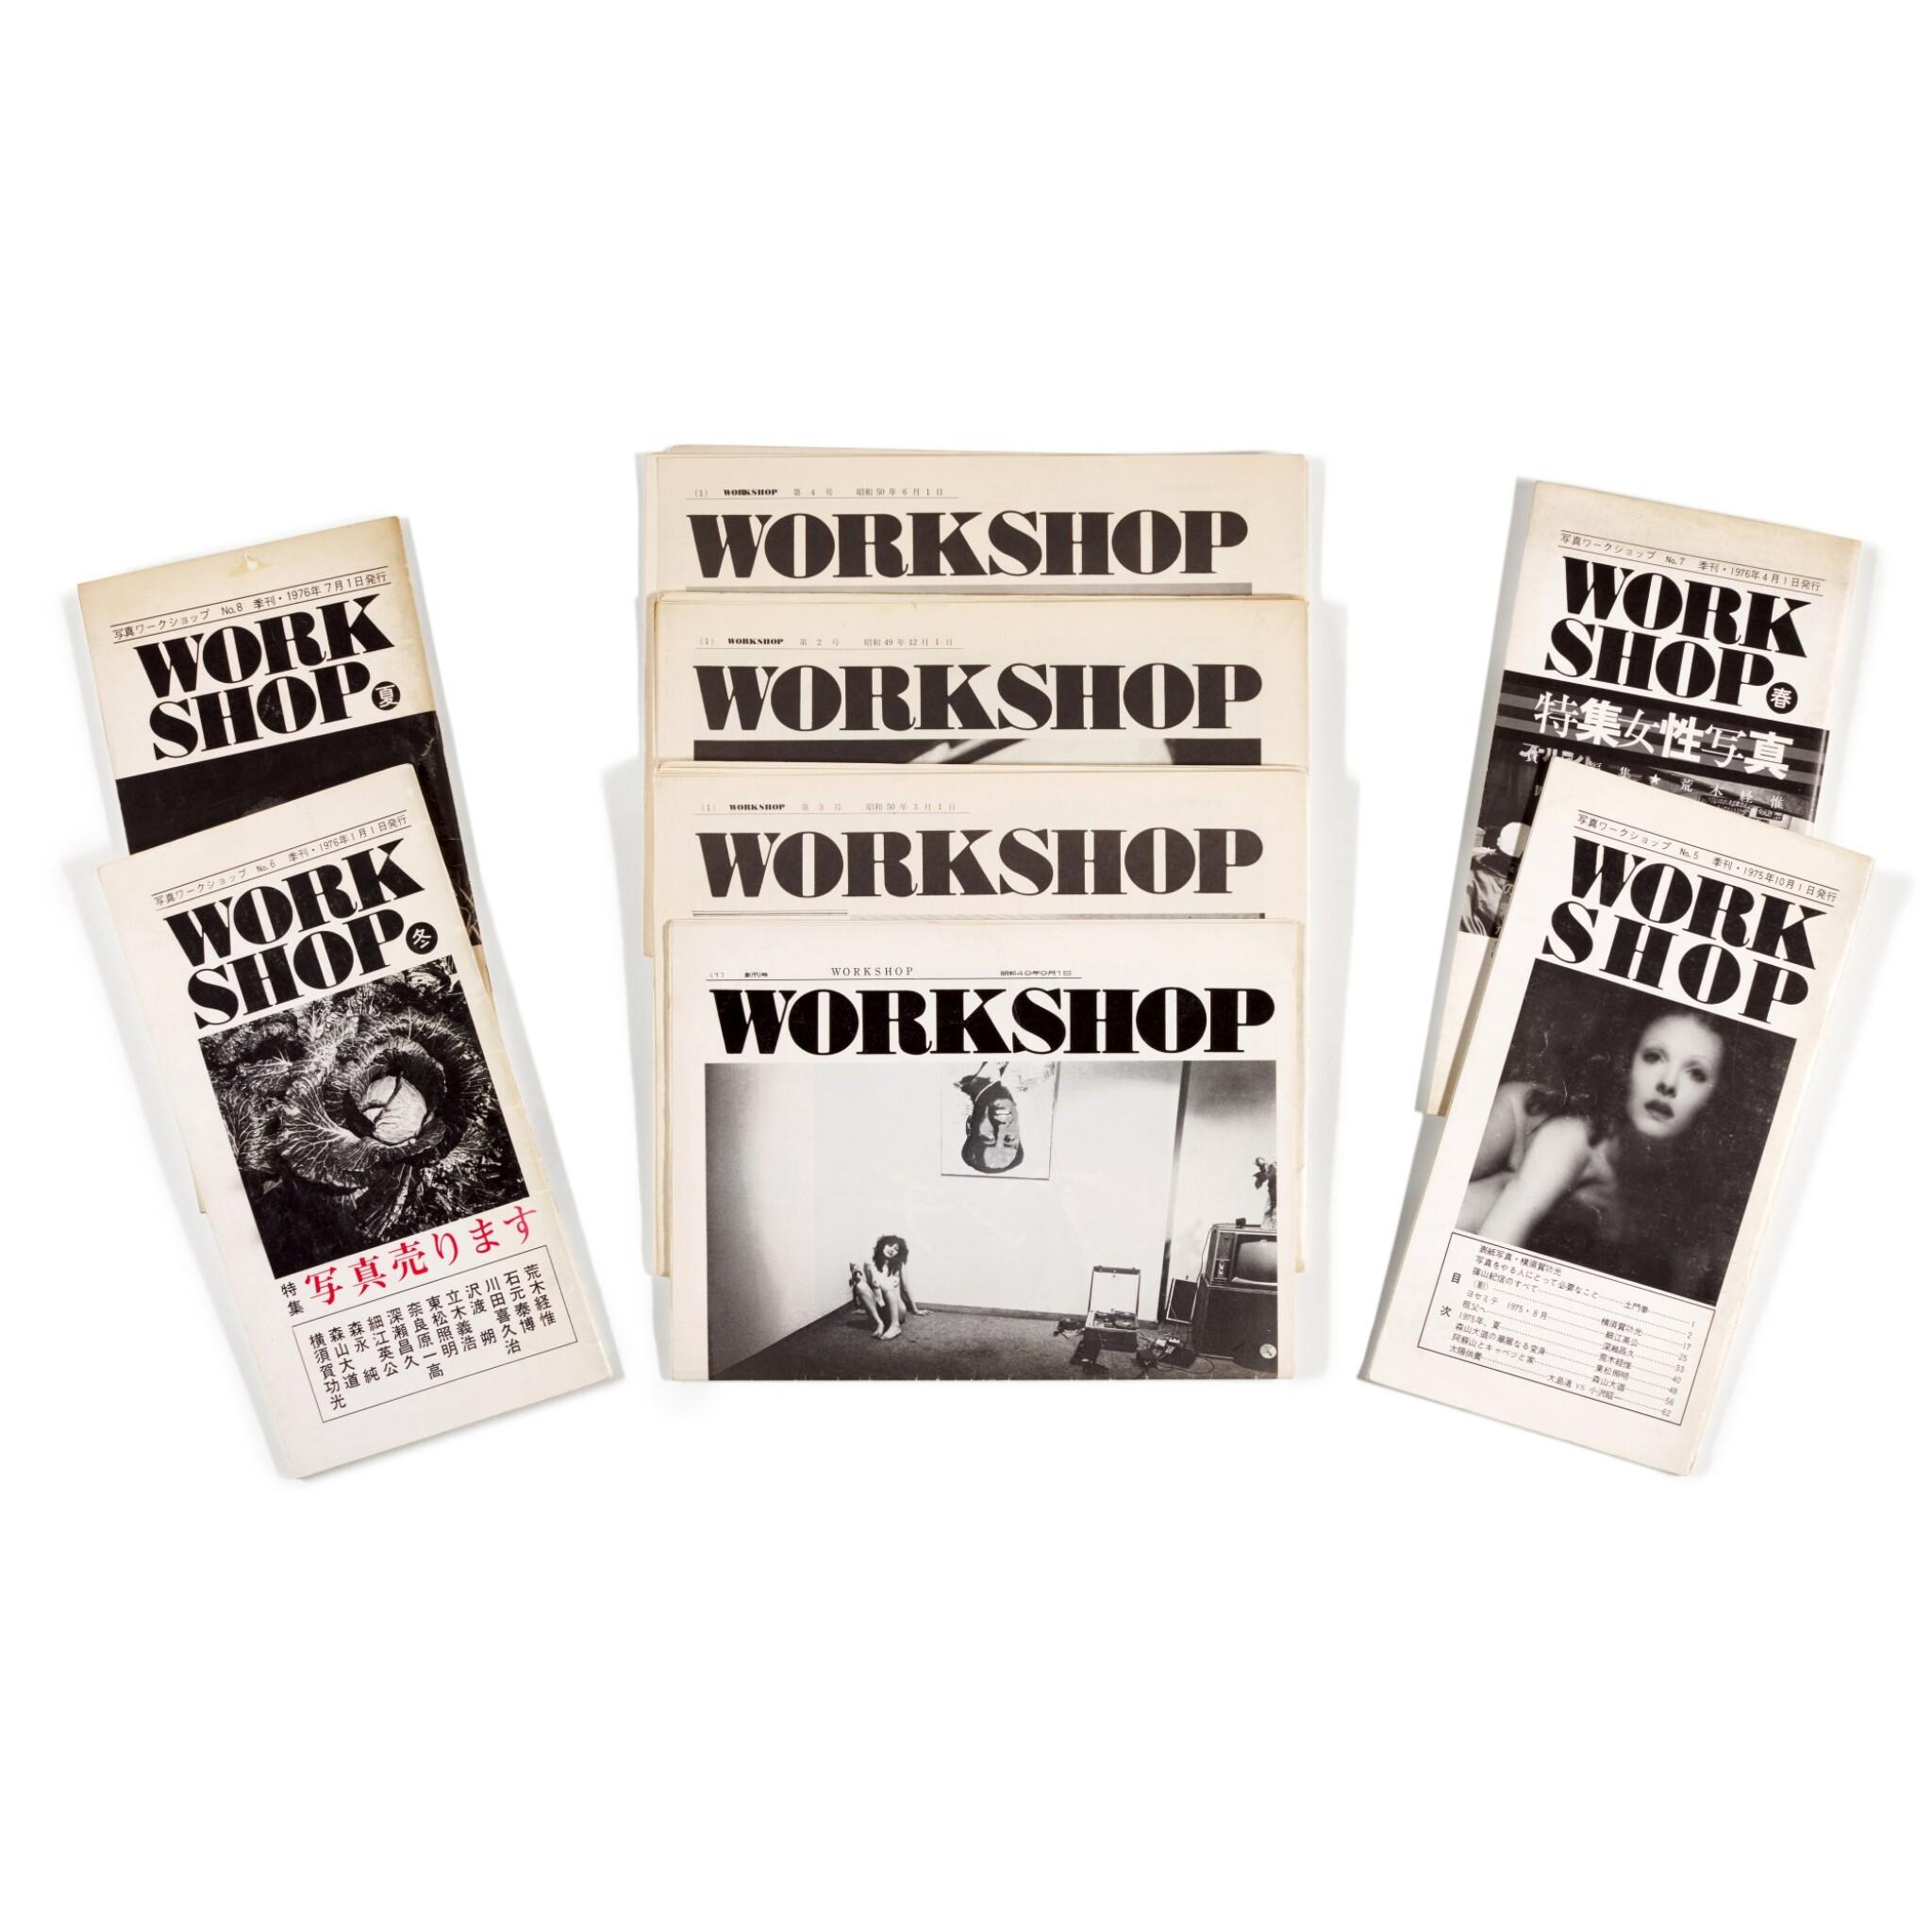 View full screen - View 1 of Lot 10.  WORKSHOP COLLECTIVE (SHOMEI TOMATSU; DAIDO MORIYAMA; NOBUYUSHI ARAKI; EIKOH HOSOE; MASAHISA FUKASE; NORIAKI YOKOSUKA ET. AL.) |  WORKSHOP VOL 1-8, SEPTEMBER 1974-JULY 1976.